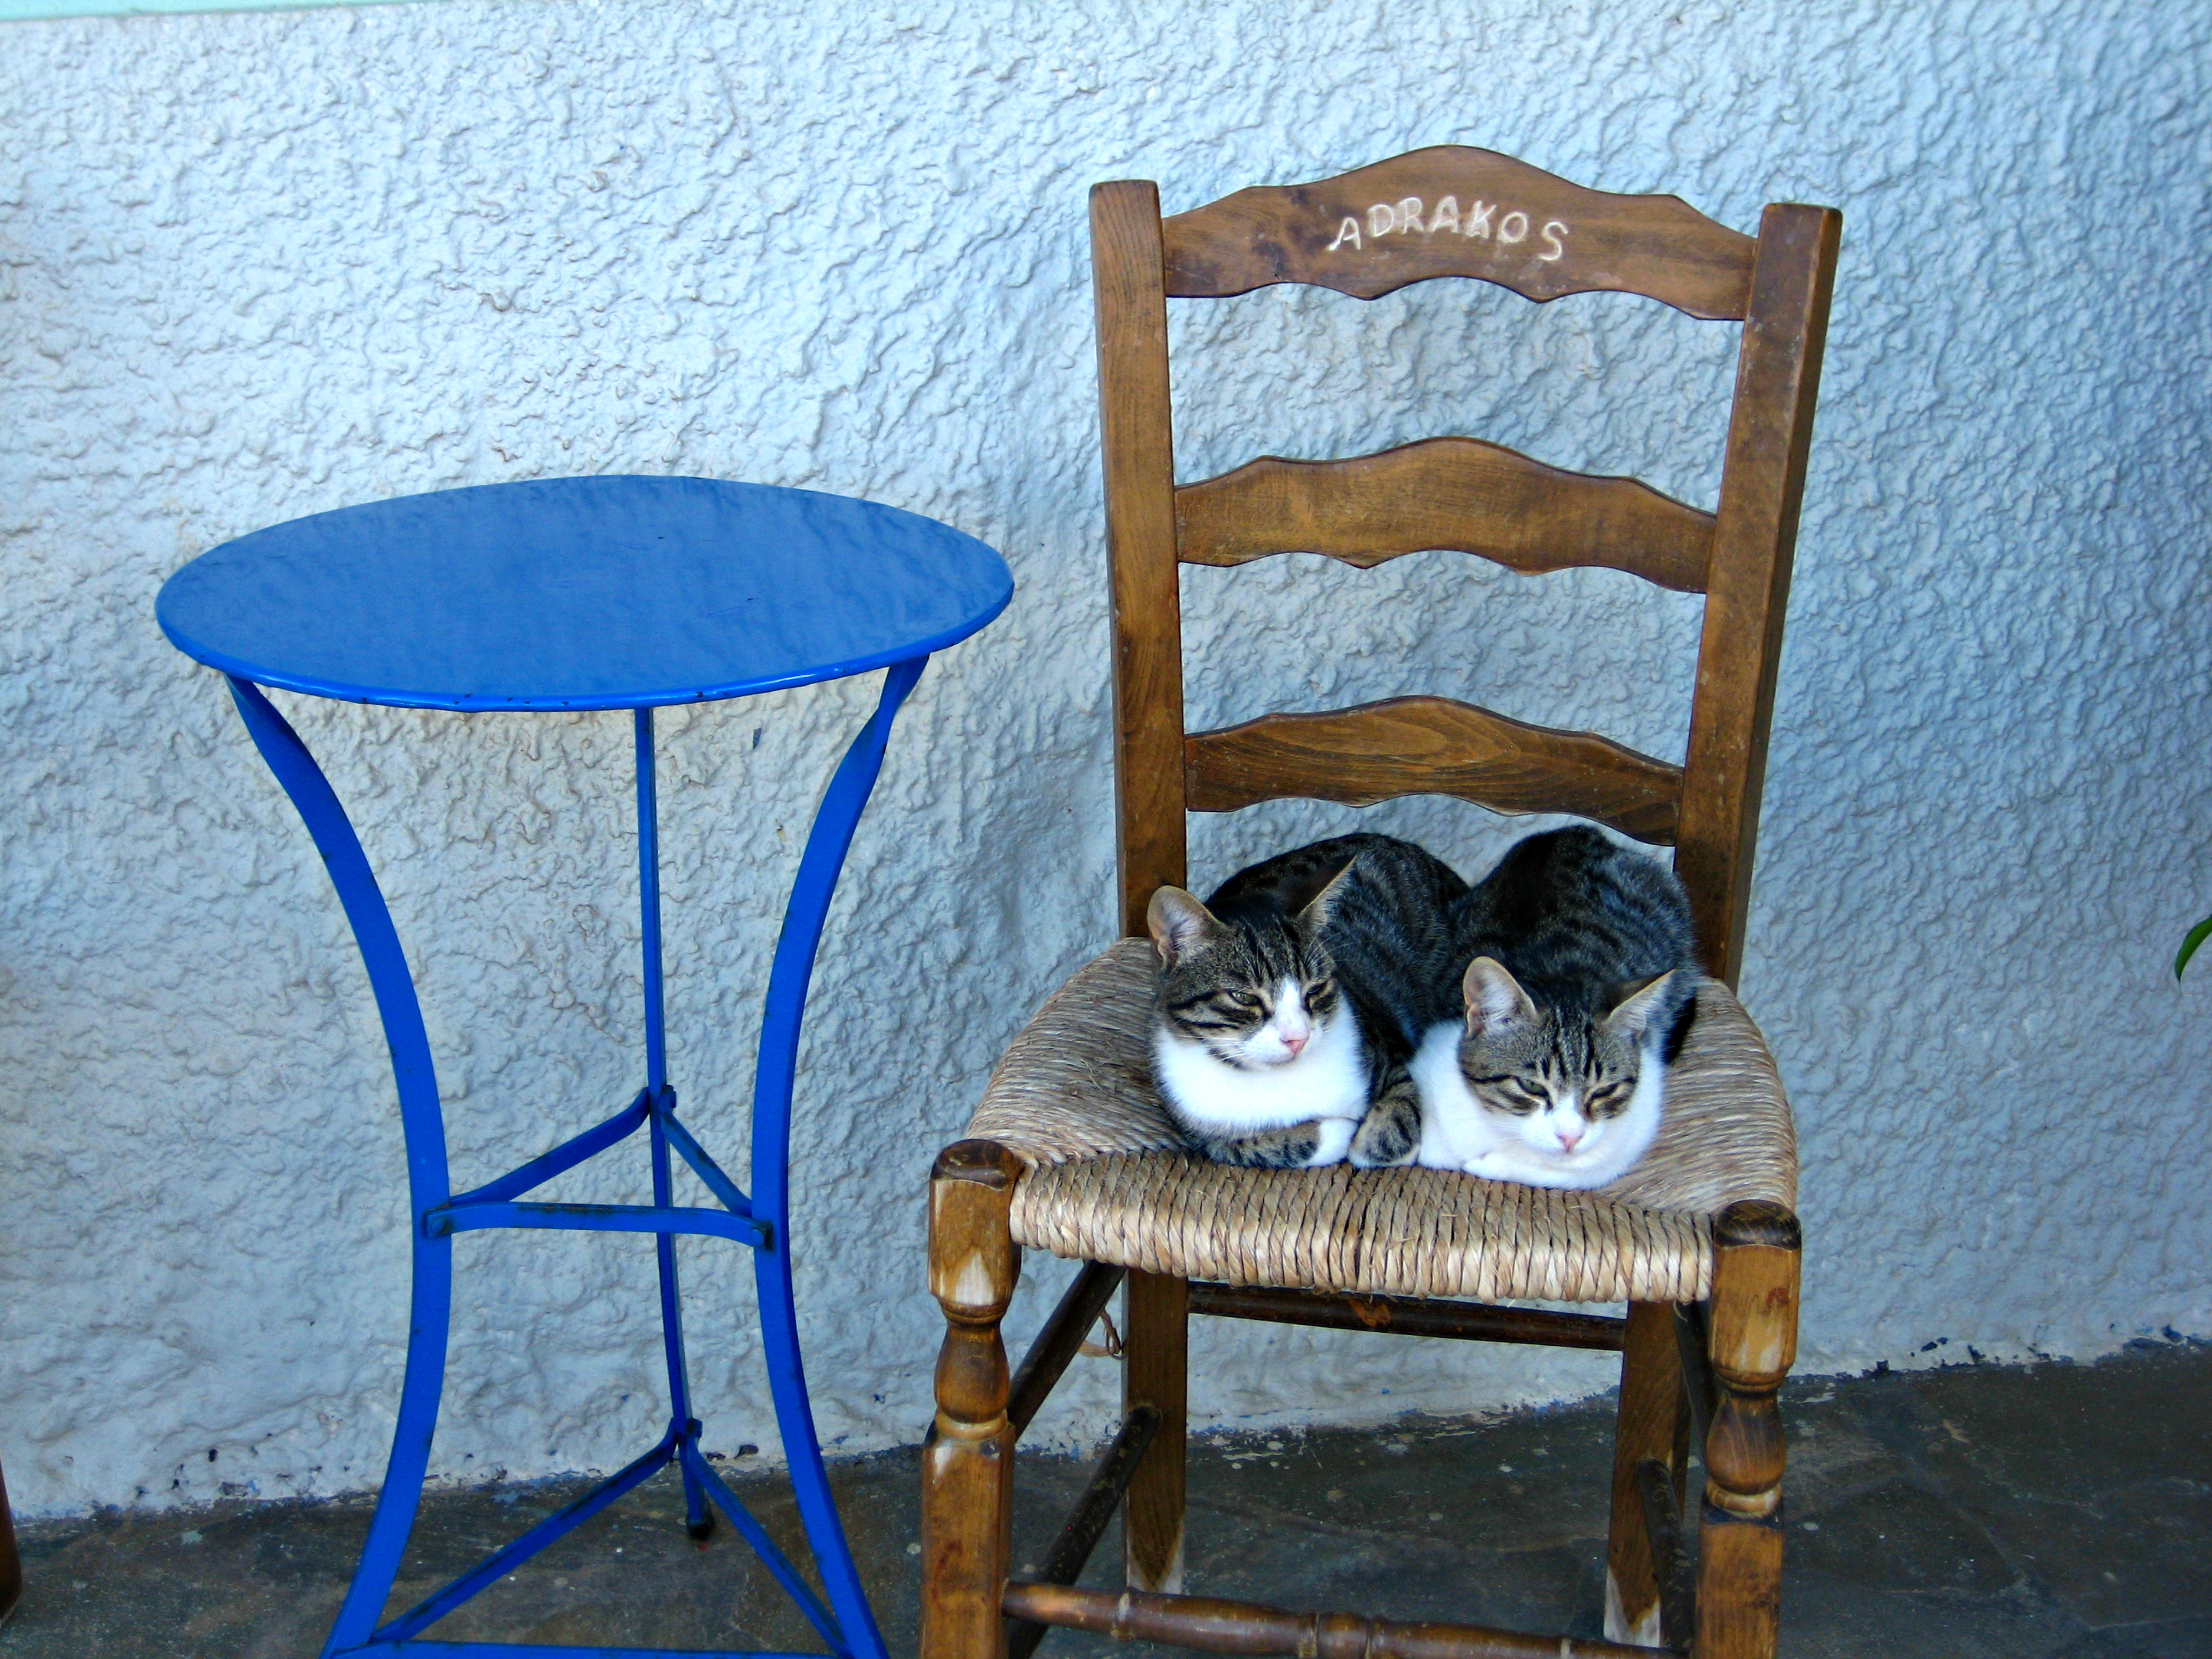 Adrakos cats